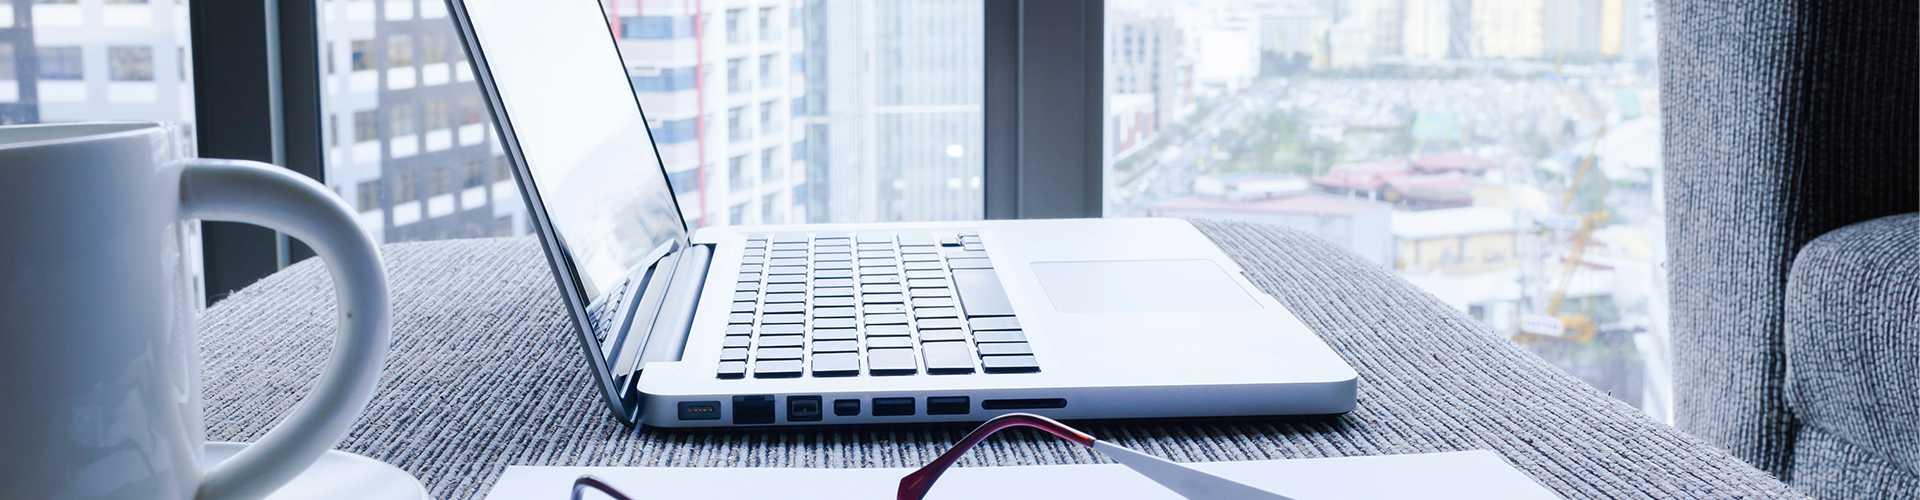 laptop notebook reparatur reparaturen g ttingen wws intercom gmbh systemhaus aus g ttingen. Black Bedroom Furniture Sets. Home Design Ideas